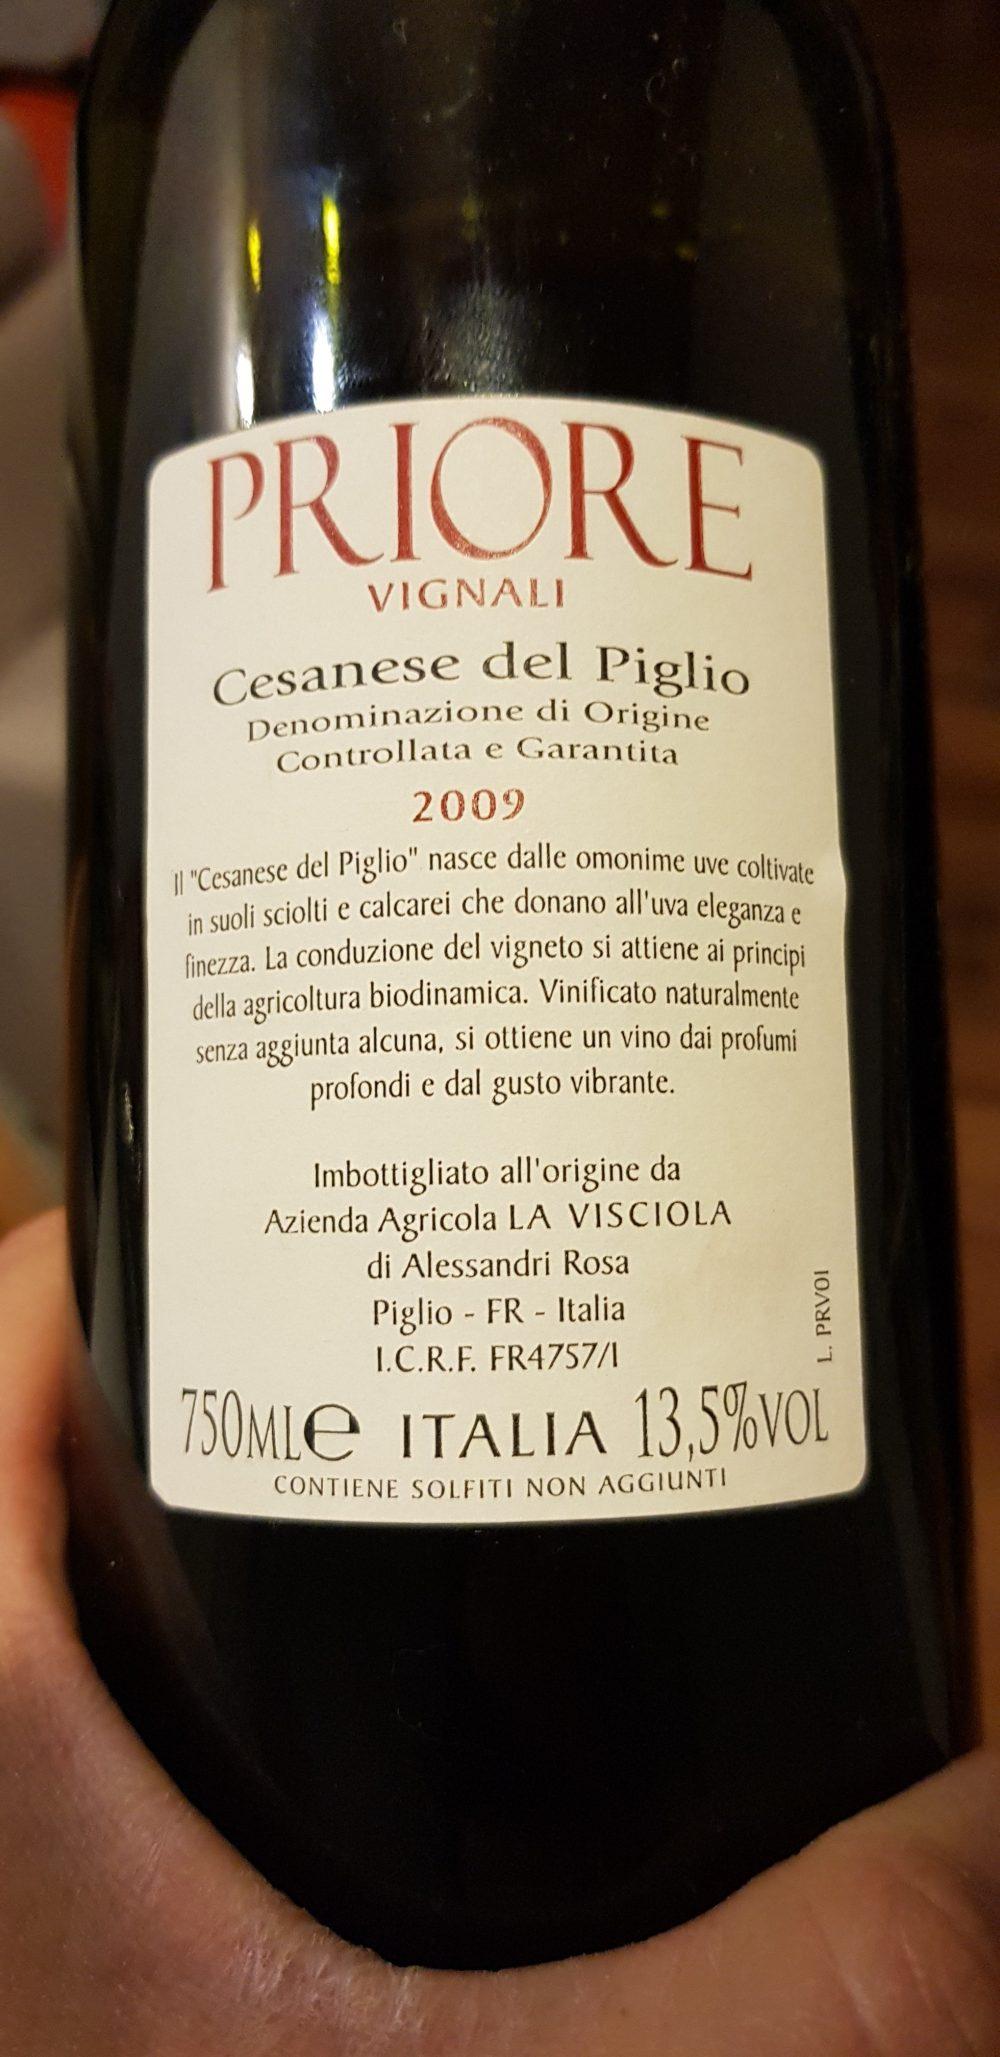 La Visciola - Cesanese del Piglio Priore Vignali 2009